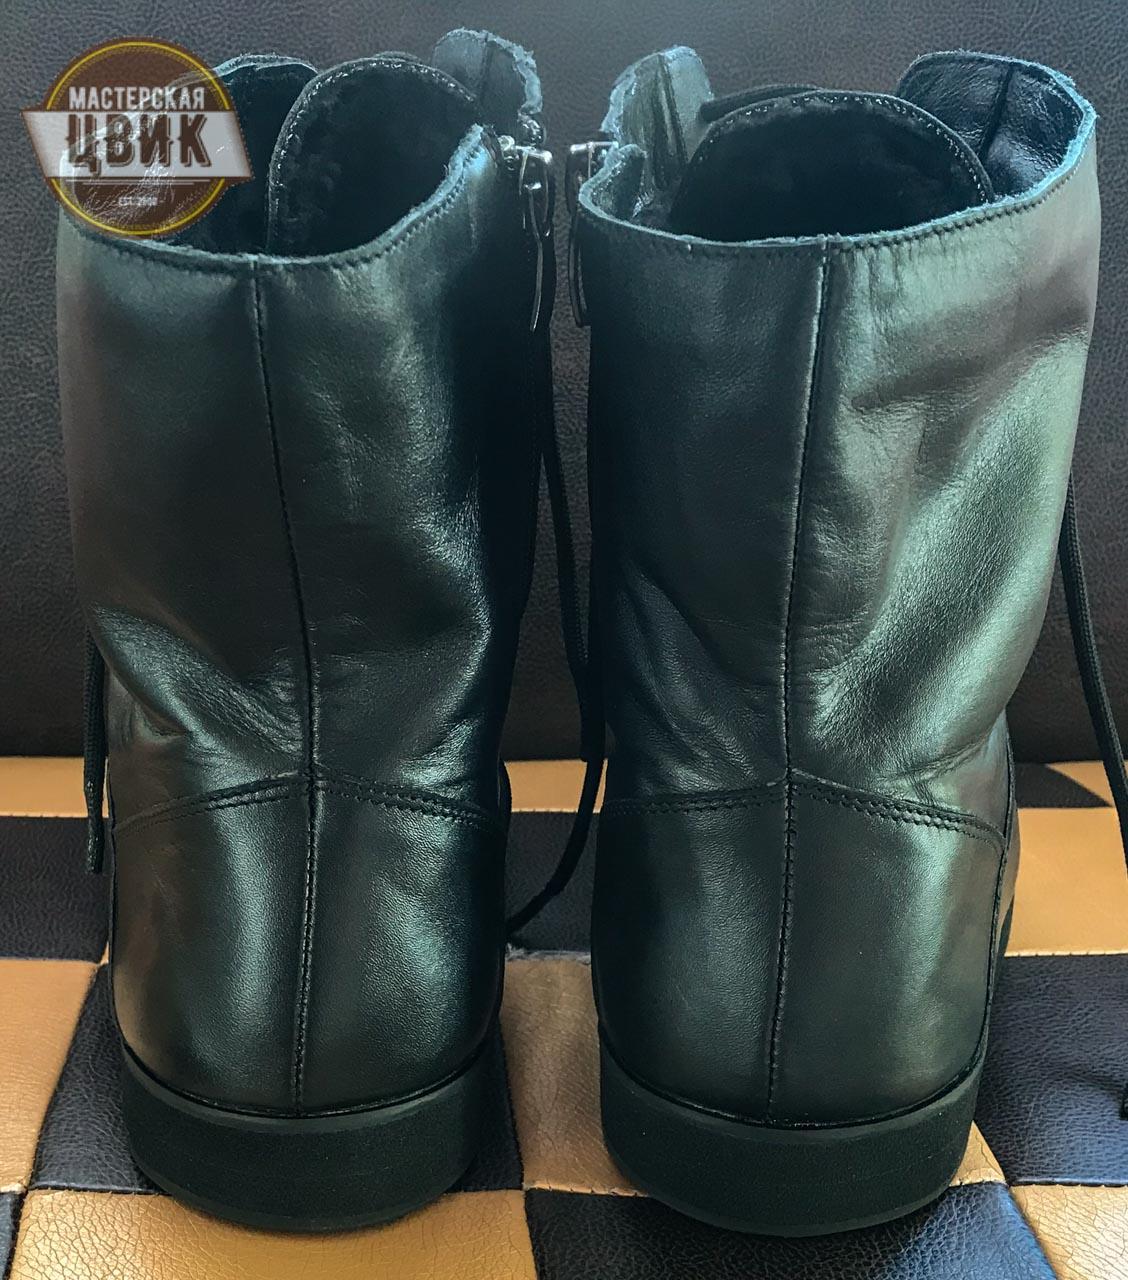 individualnyj-poshiv-obuvi-minsk-2 Индивидуальный пошив обуви